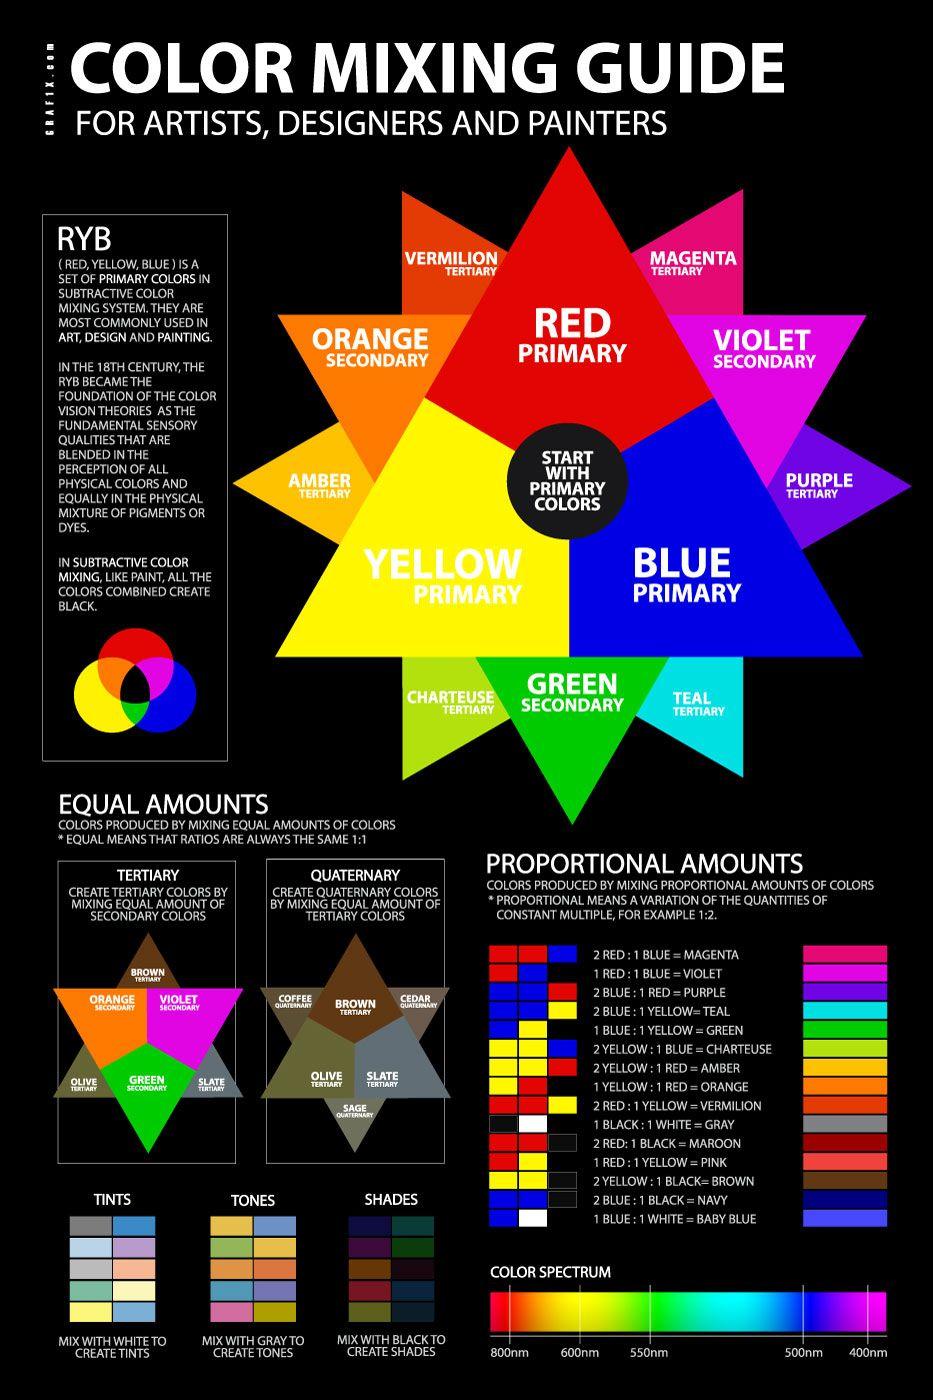 ryb color mixing chart guide poster tool formula pdf | Art*Classroom